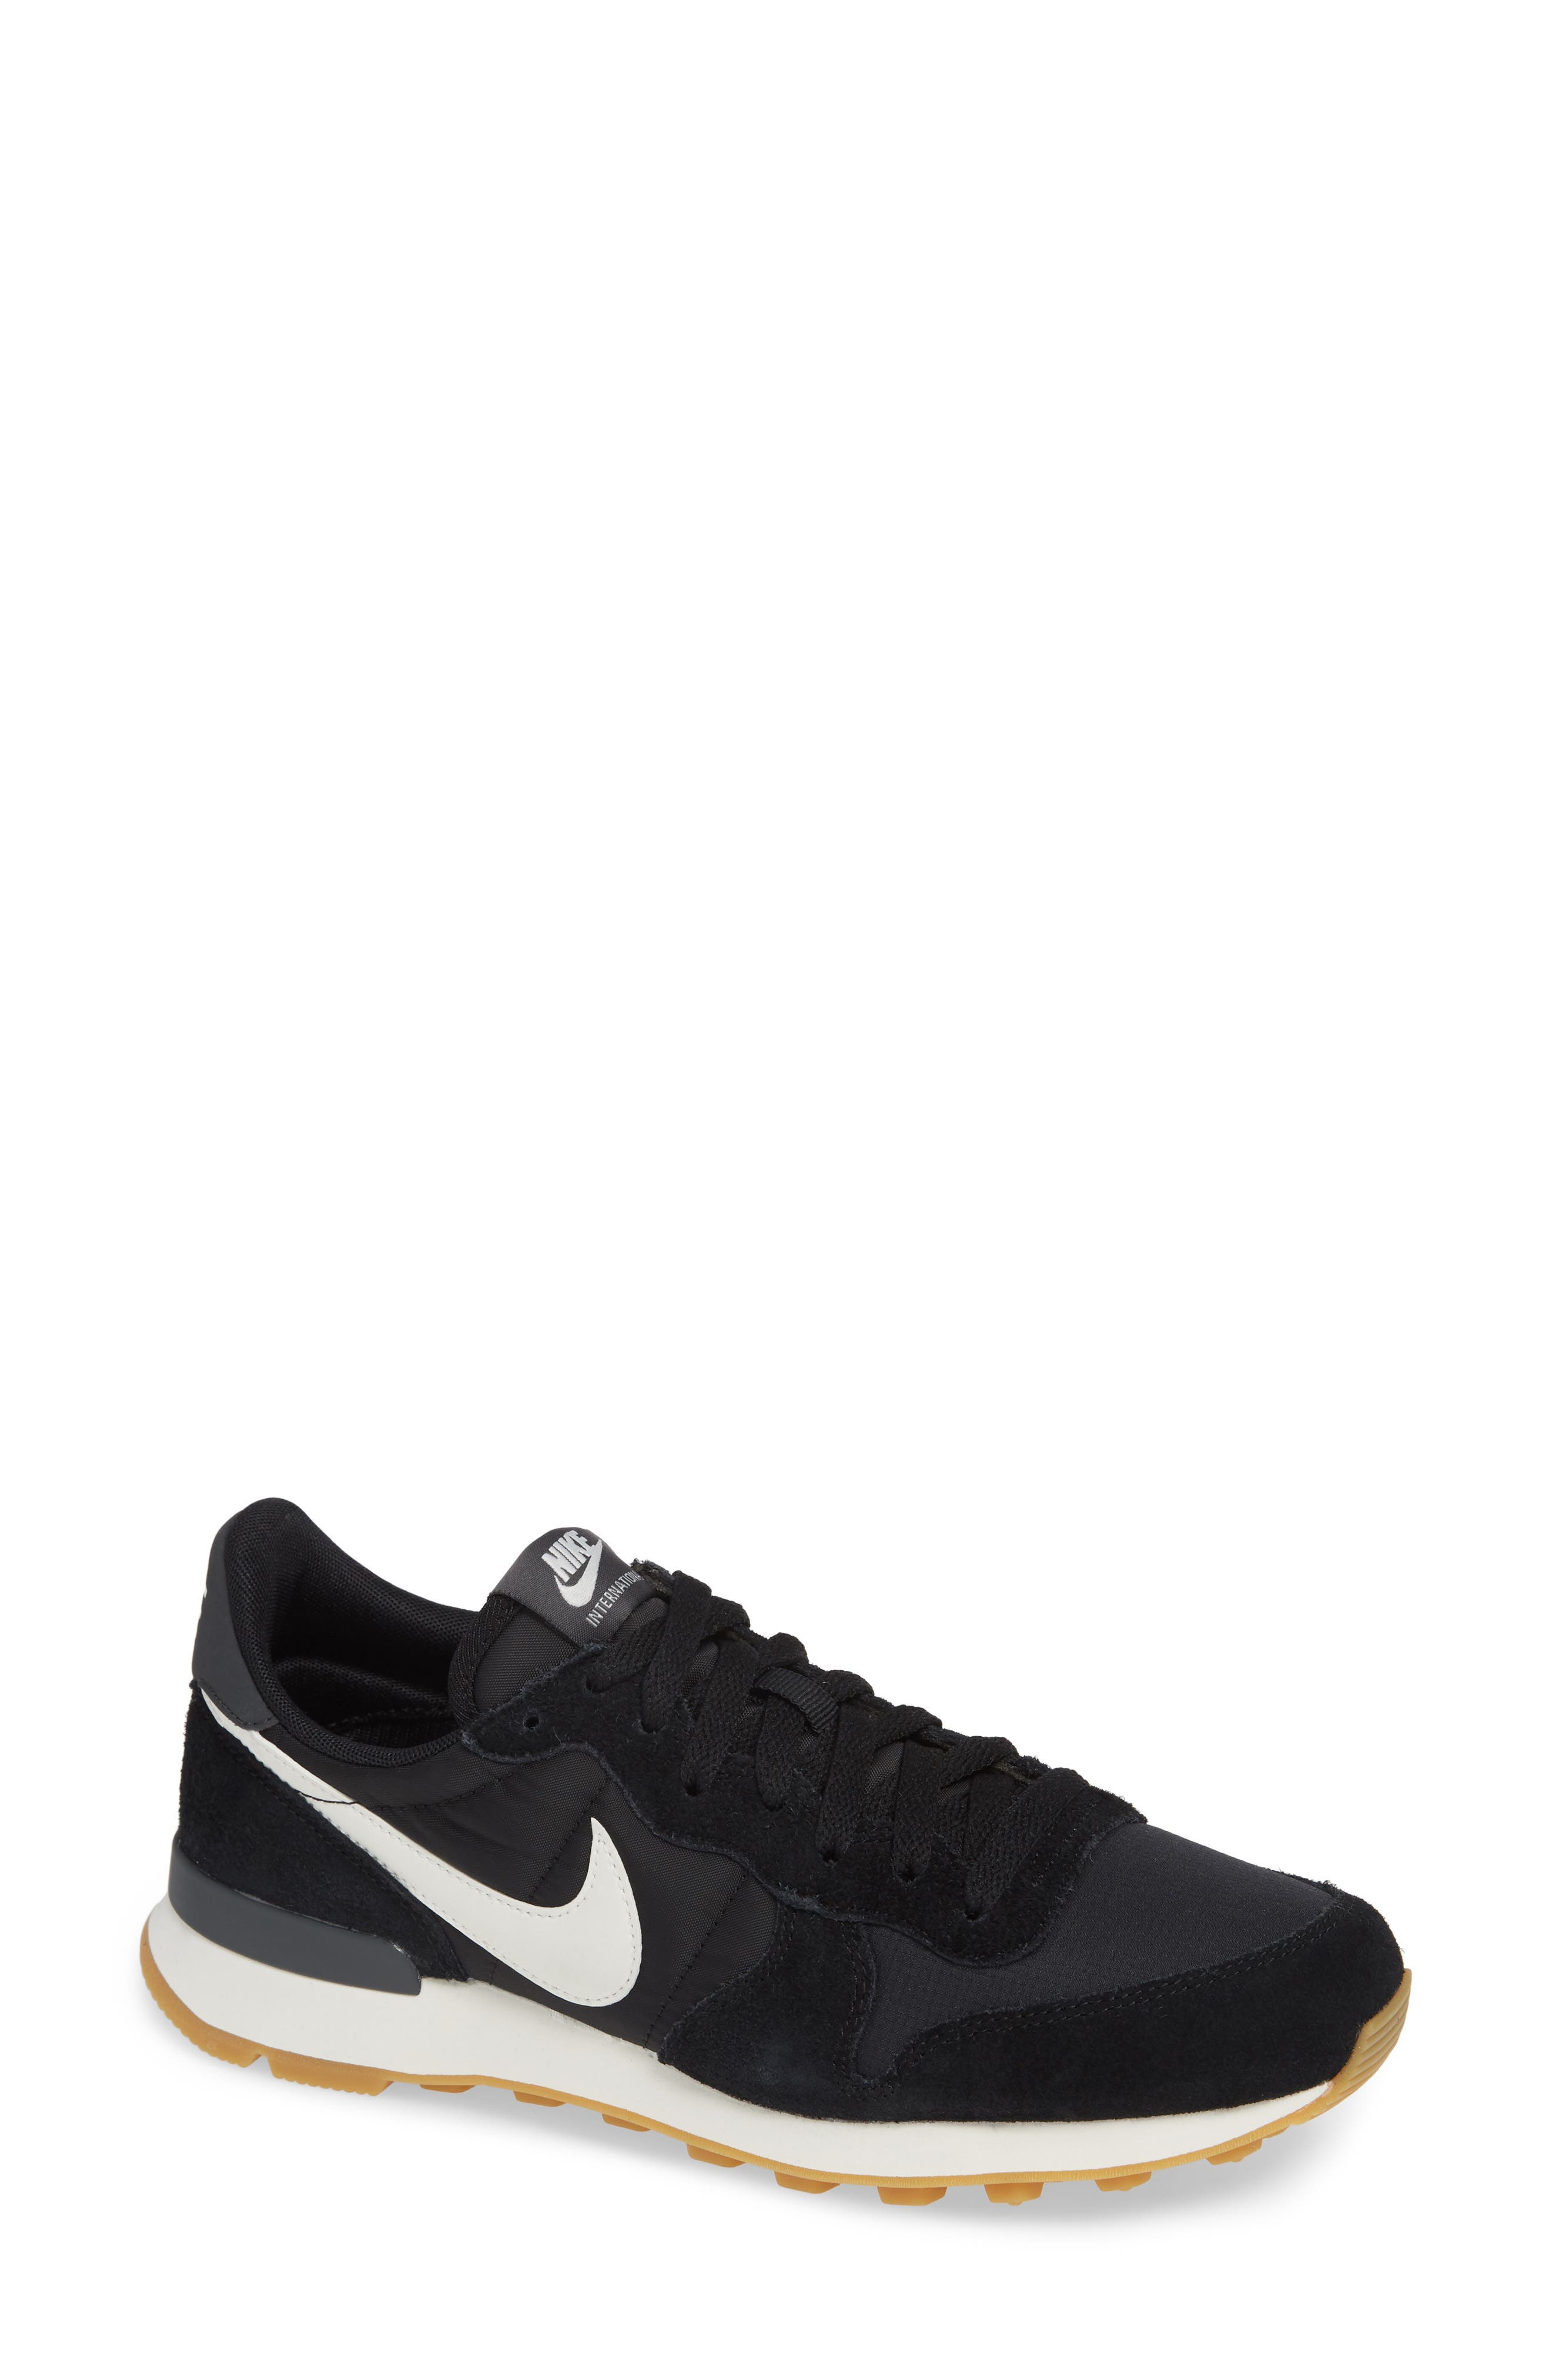 NIKE, 'Internationalist' Sneaker, Main thumbnail 1, color, 001